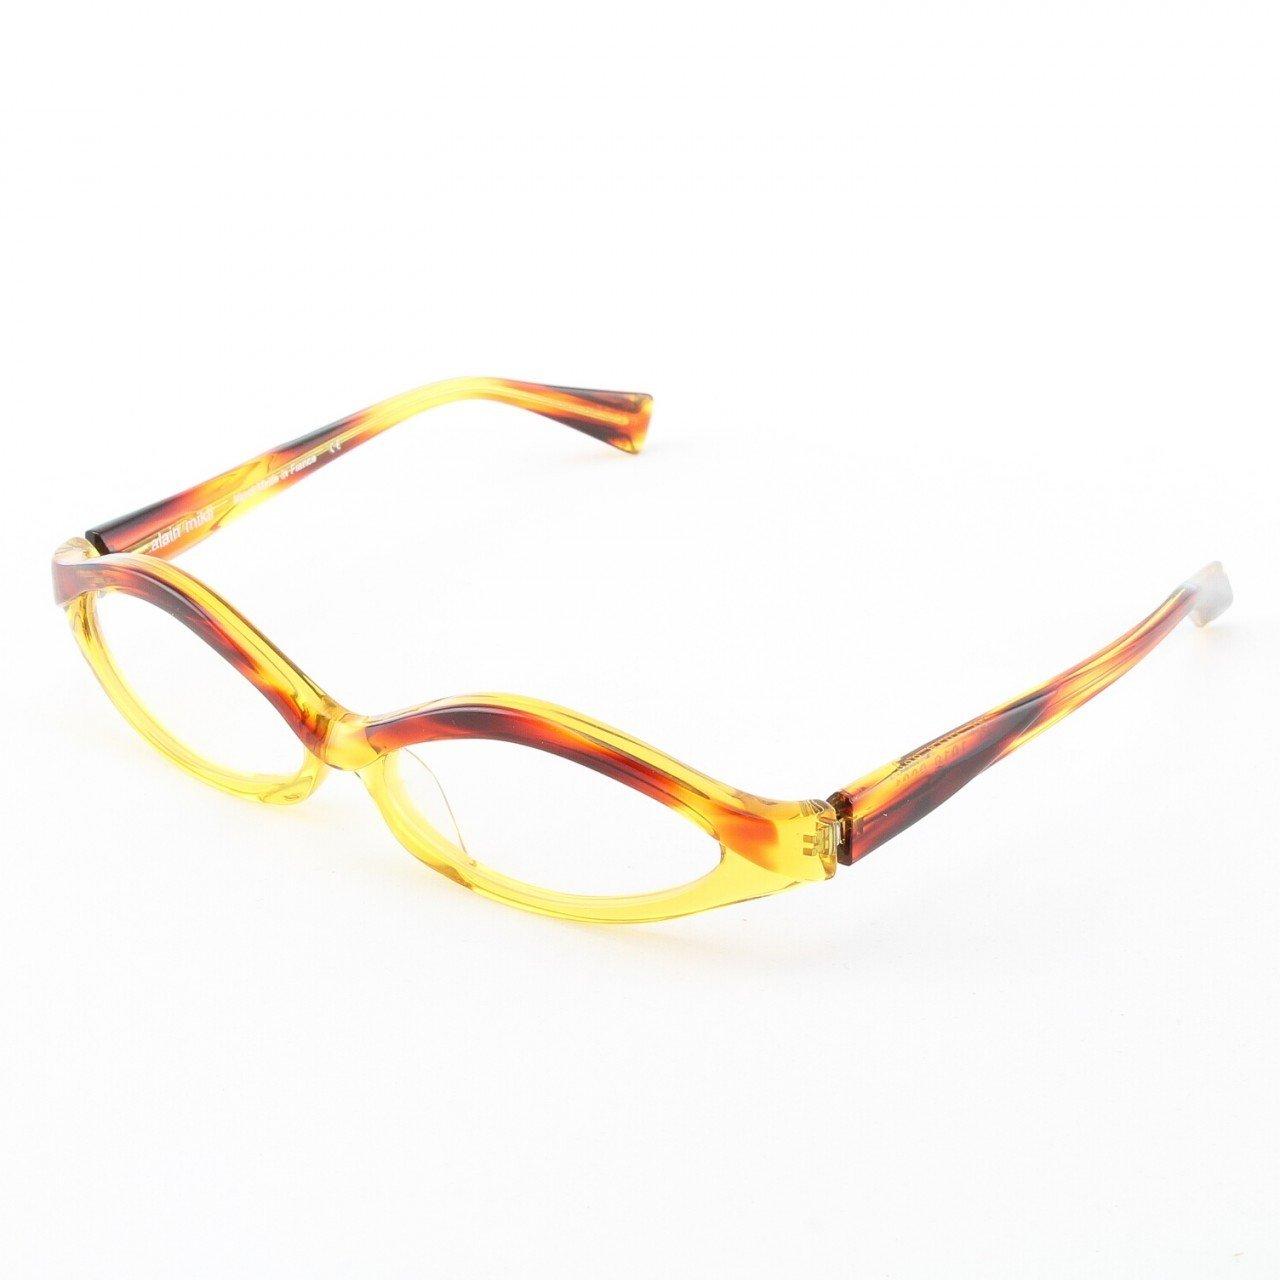 Alain Mikli Eyeglasses AL1018 Col. 1 Mottled Amber and Yellow